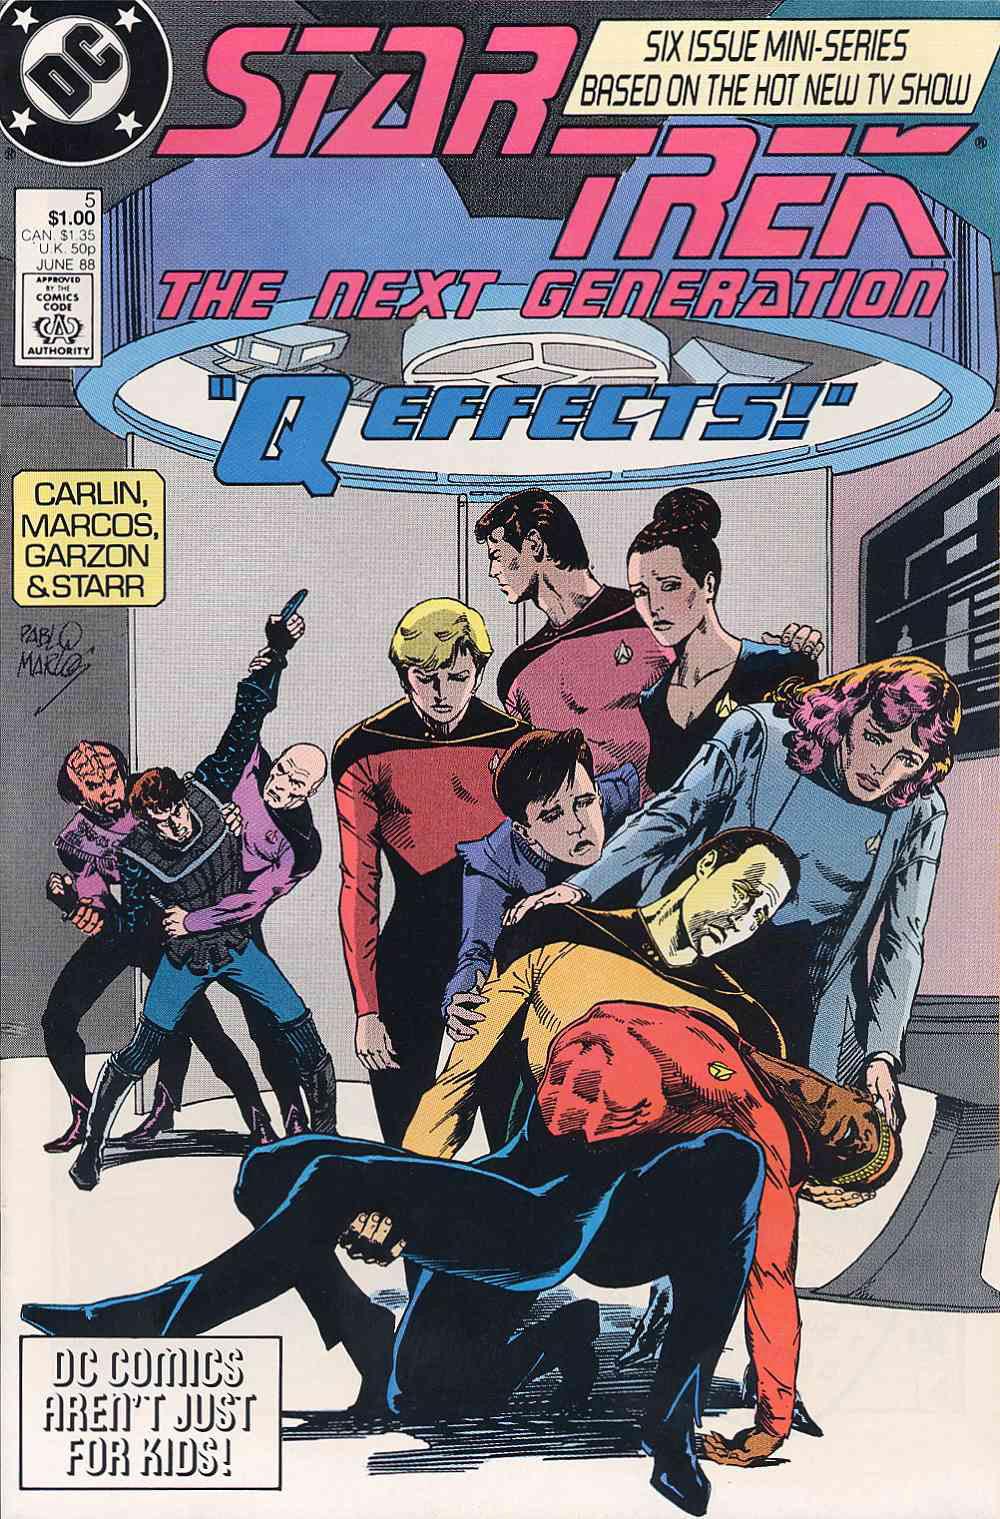 Star Trek: The Next Generation (1988) issue 5 - Page 1